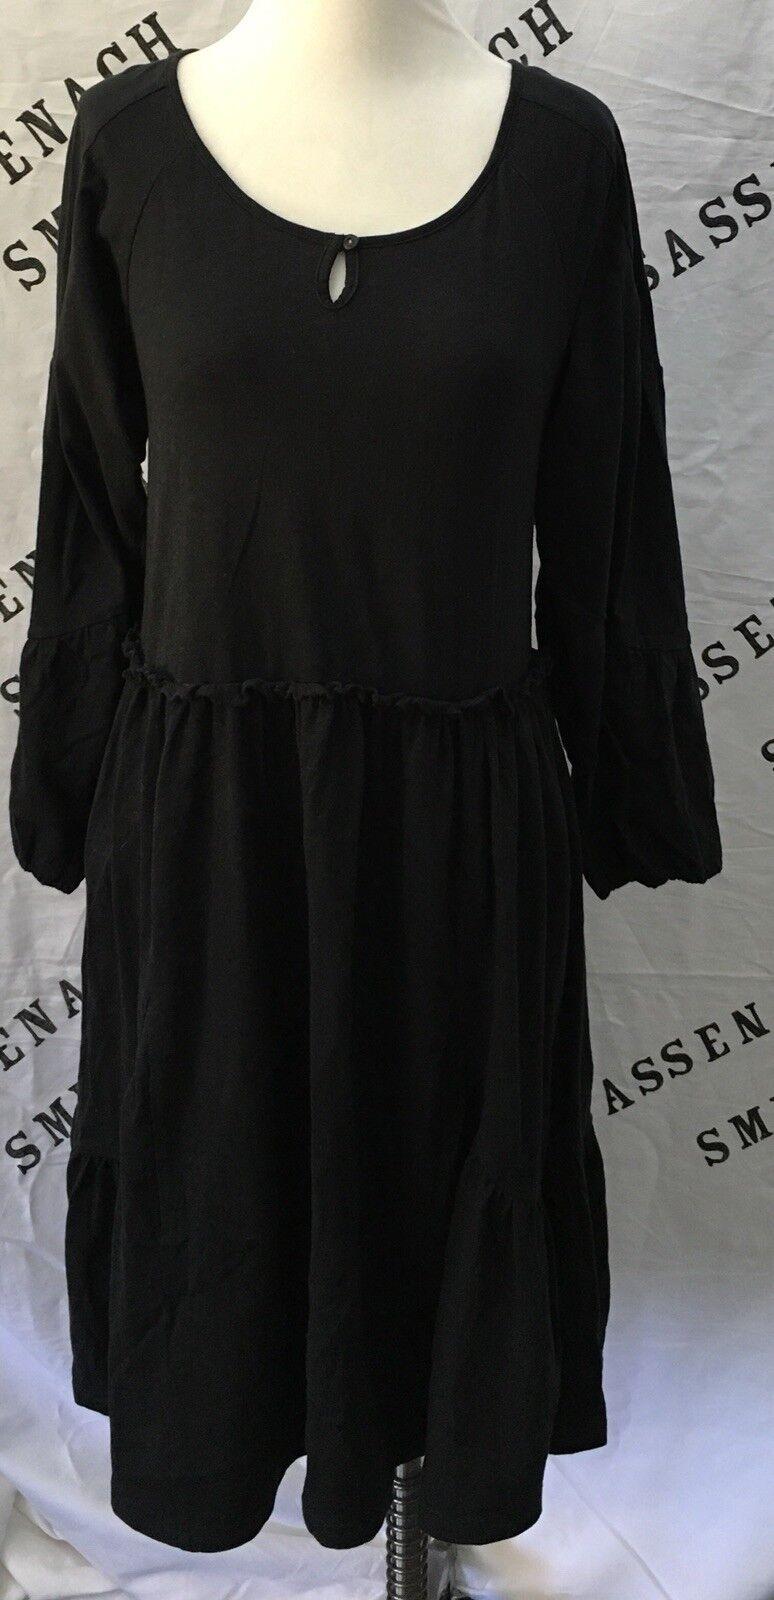 HTF damen Matilda Character Counts schwarz Charlie Dress Größe XL X Large EUC